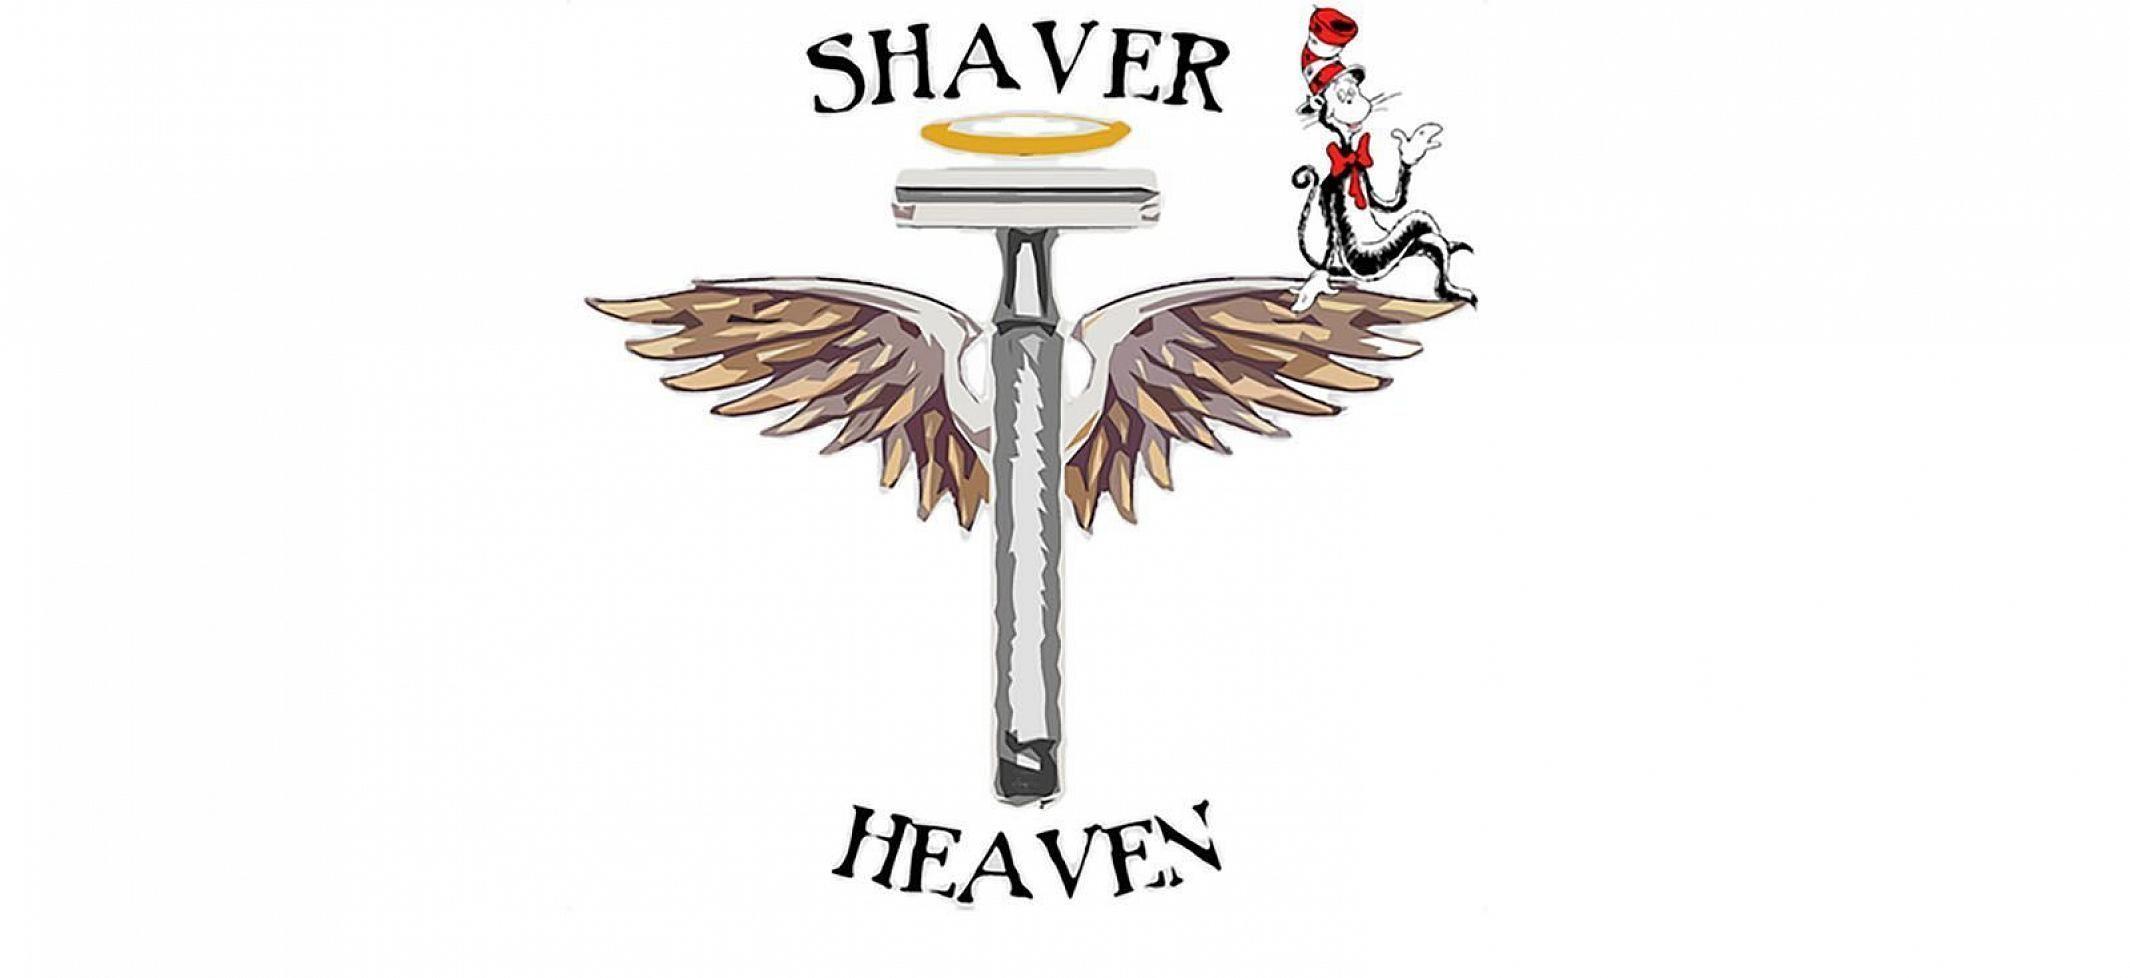 Sheaver Heaven - Going to Heaven